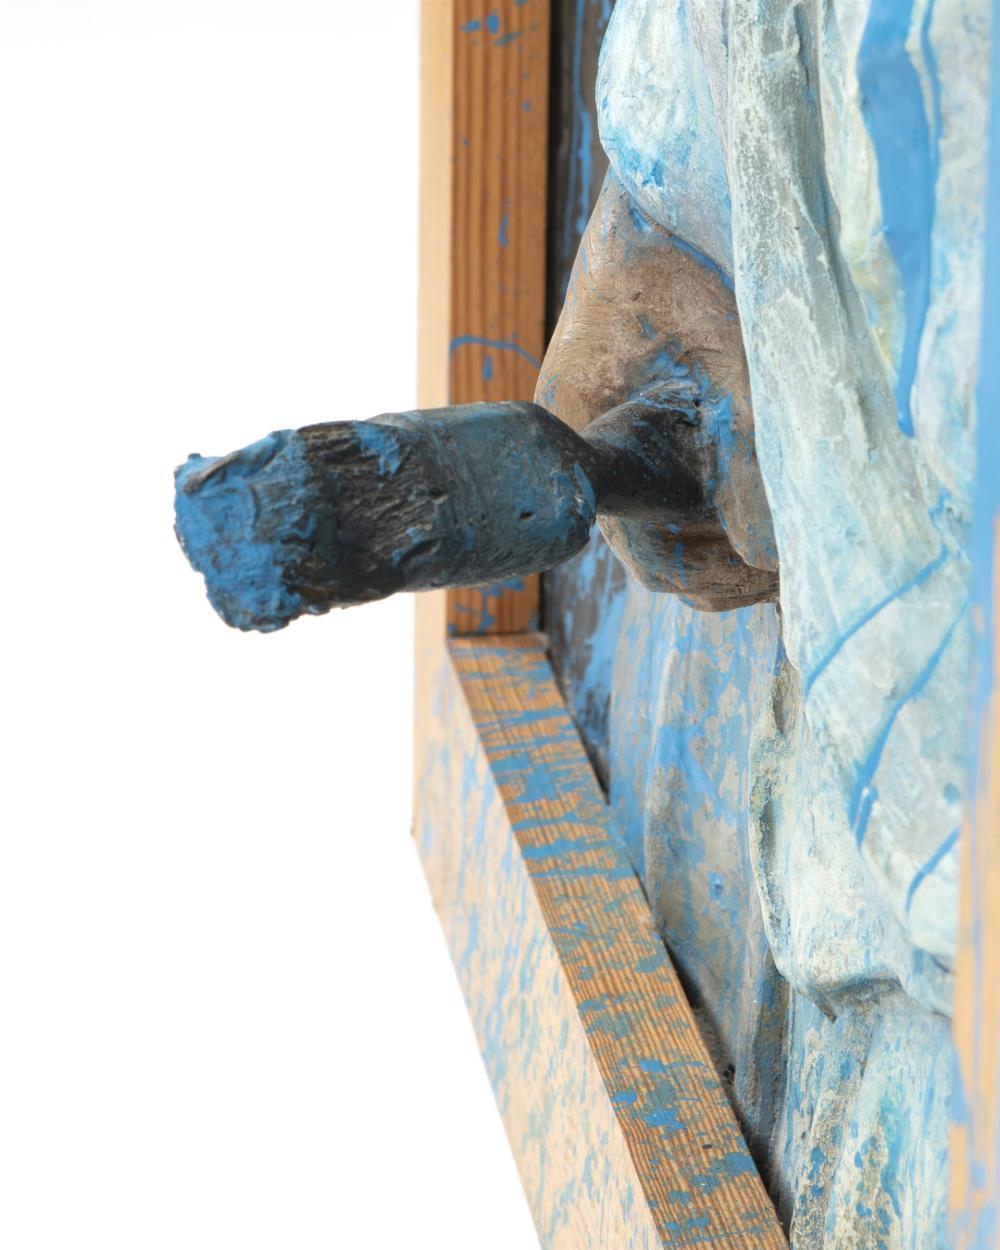 Graham Ibbeson, (b. 1951, British), Mother scolding son, 1989, Fiberglass relief wall sculpture, 39.5